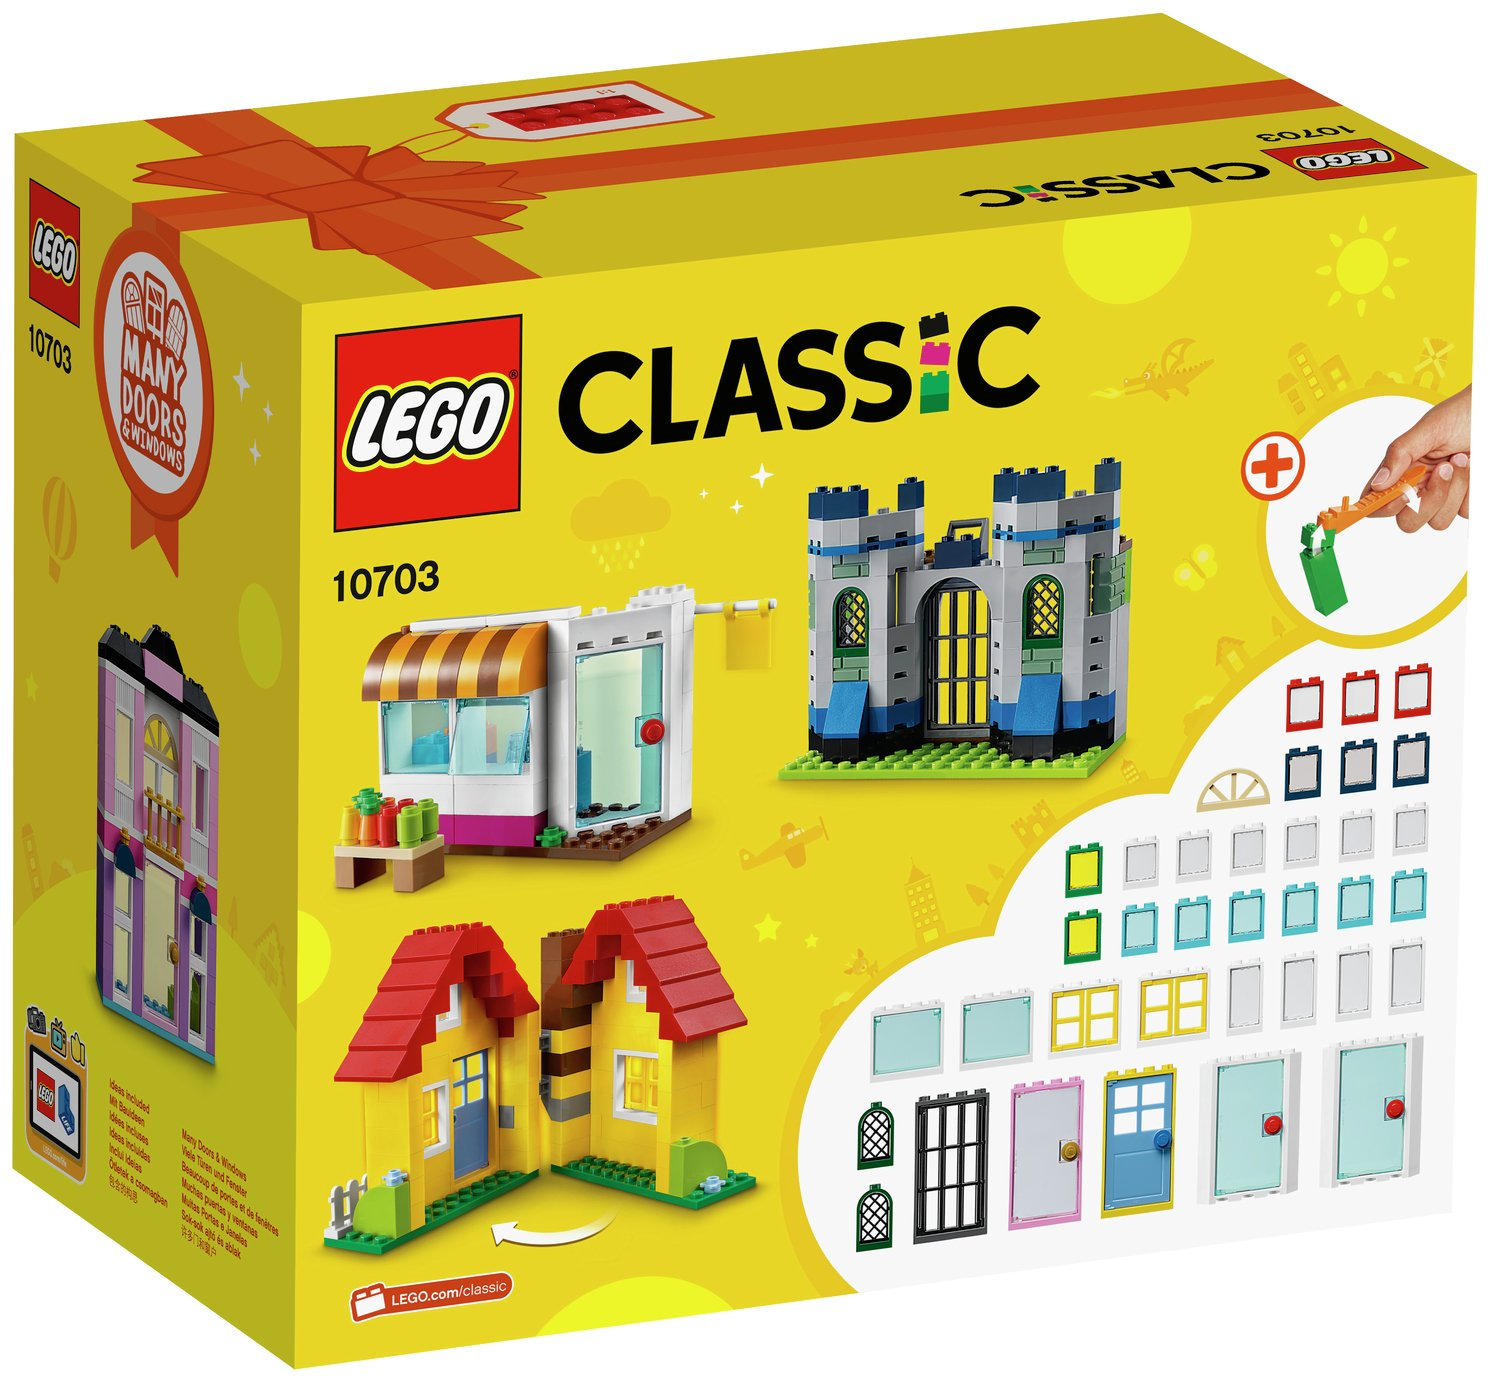 Buy LEGO Classic Creative Builder Box - 10703 | LEGO | Argos